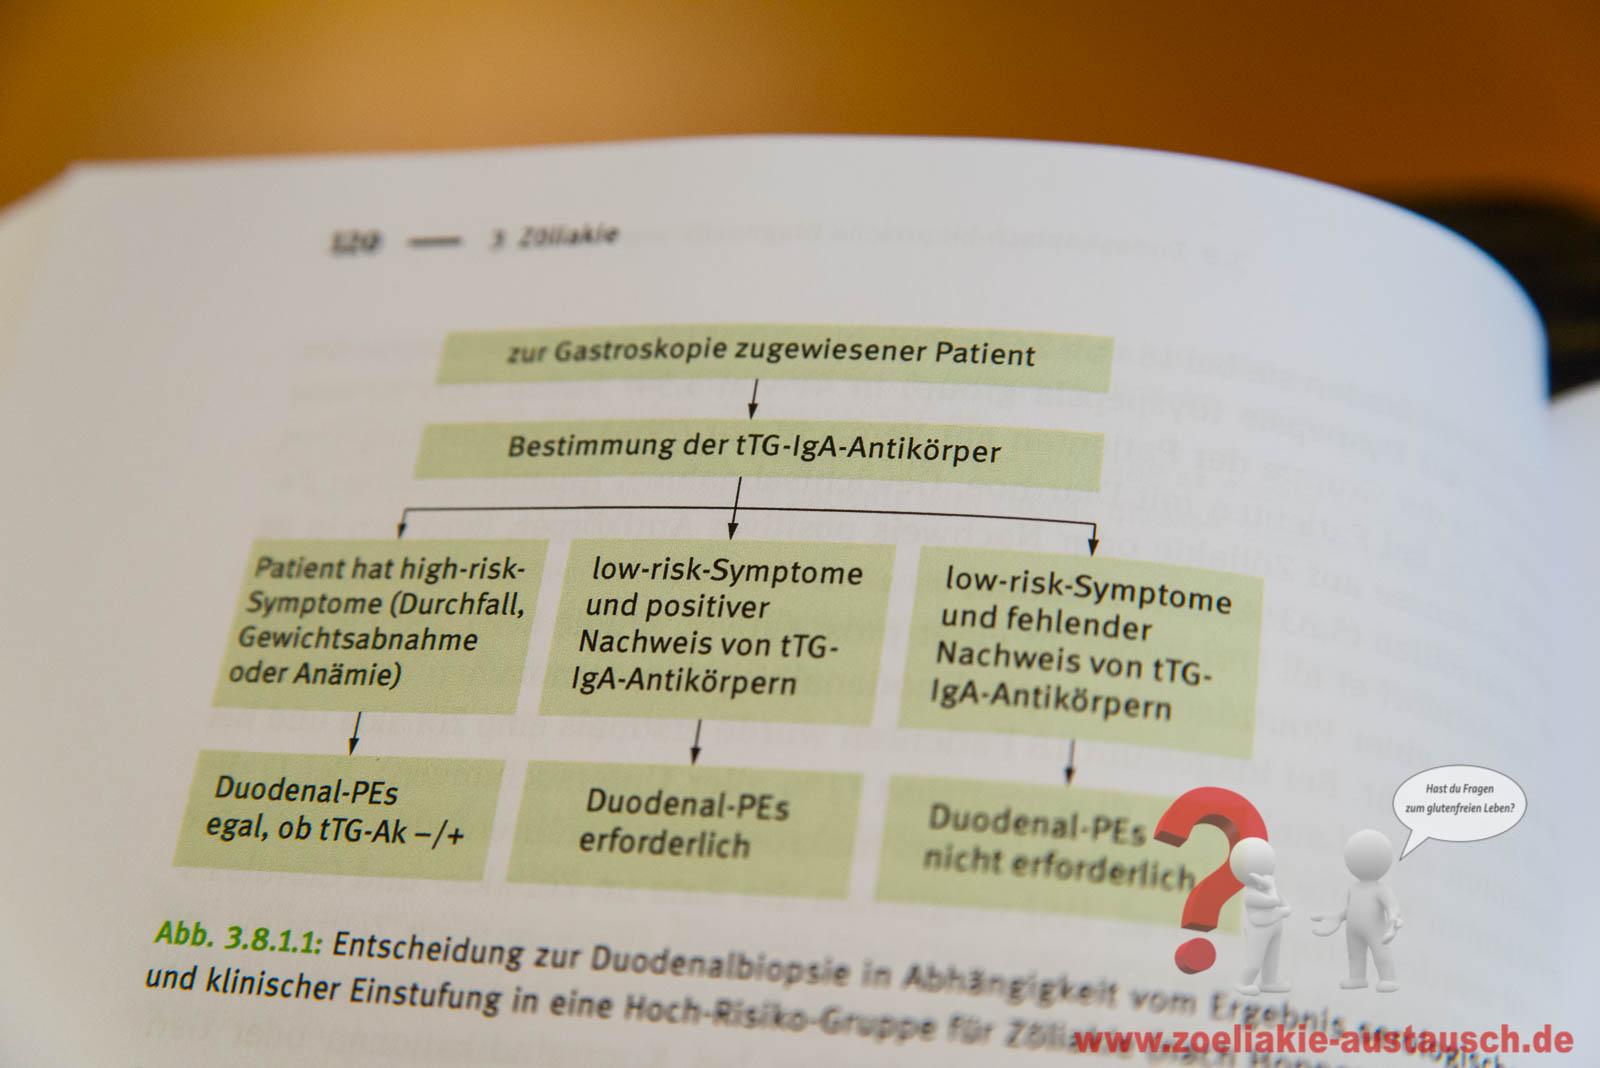 Gruyter-Leiss-Zoeliakie-20171224-JSC_4739